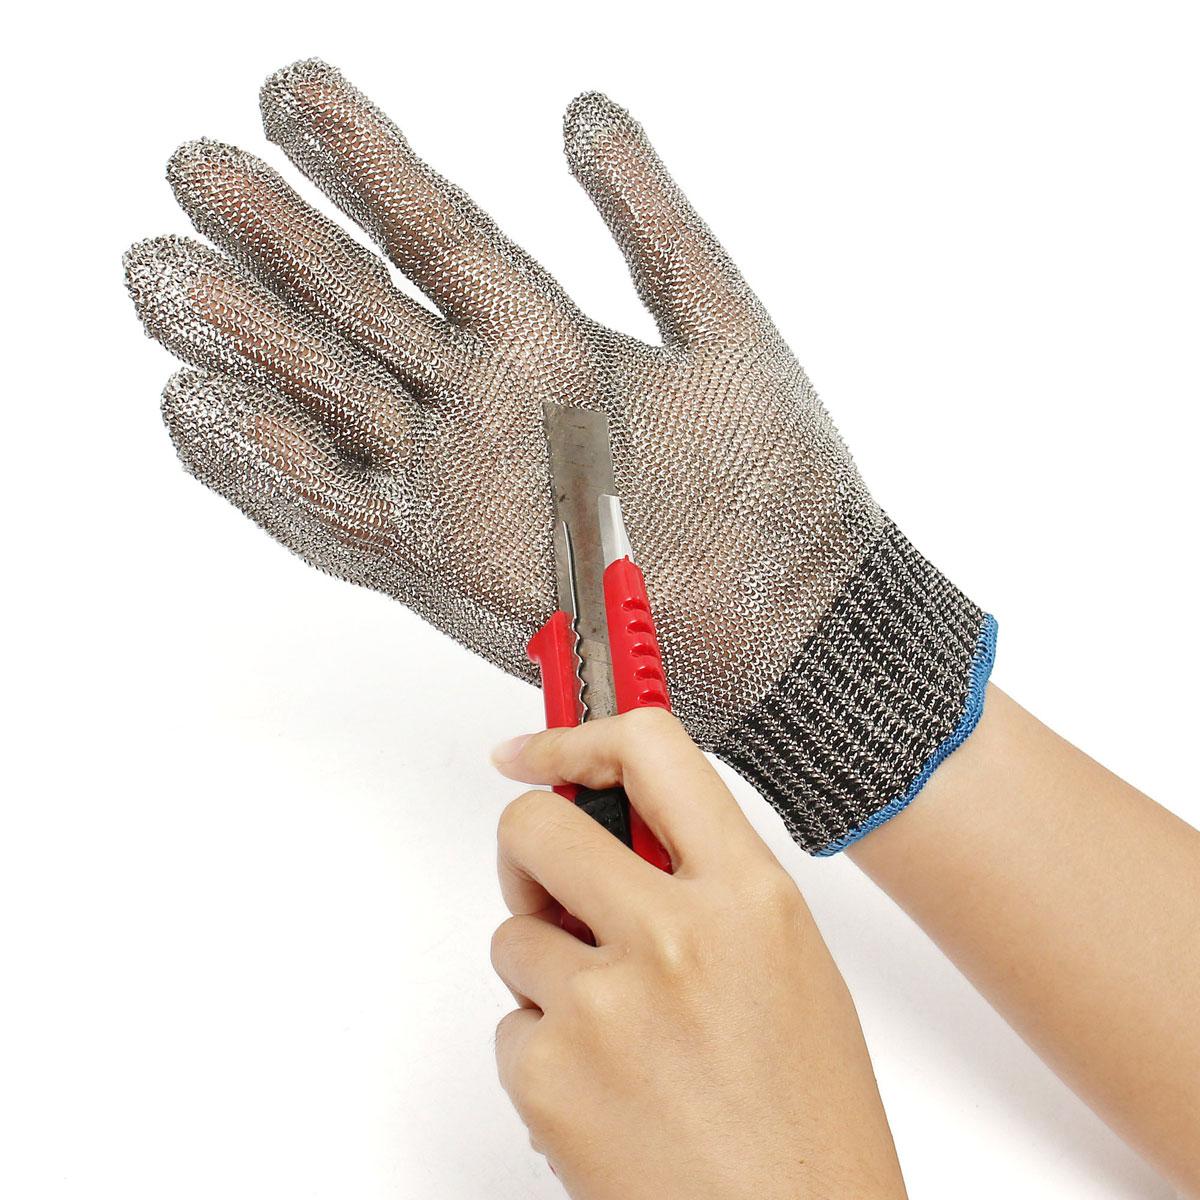 Safety Cut Proof Stab Resistant Stainless Steel Metal Mesh